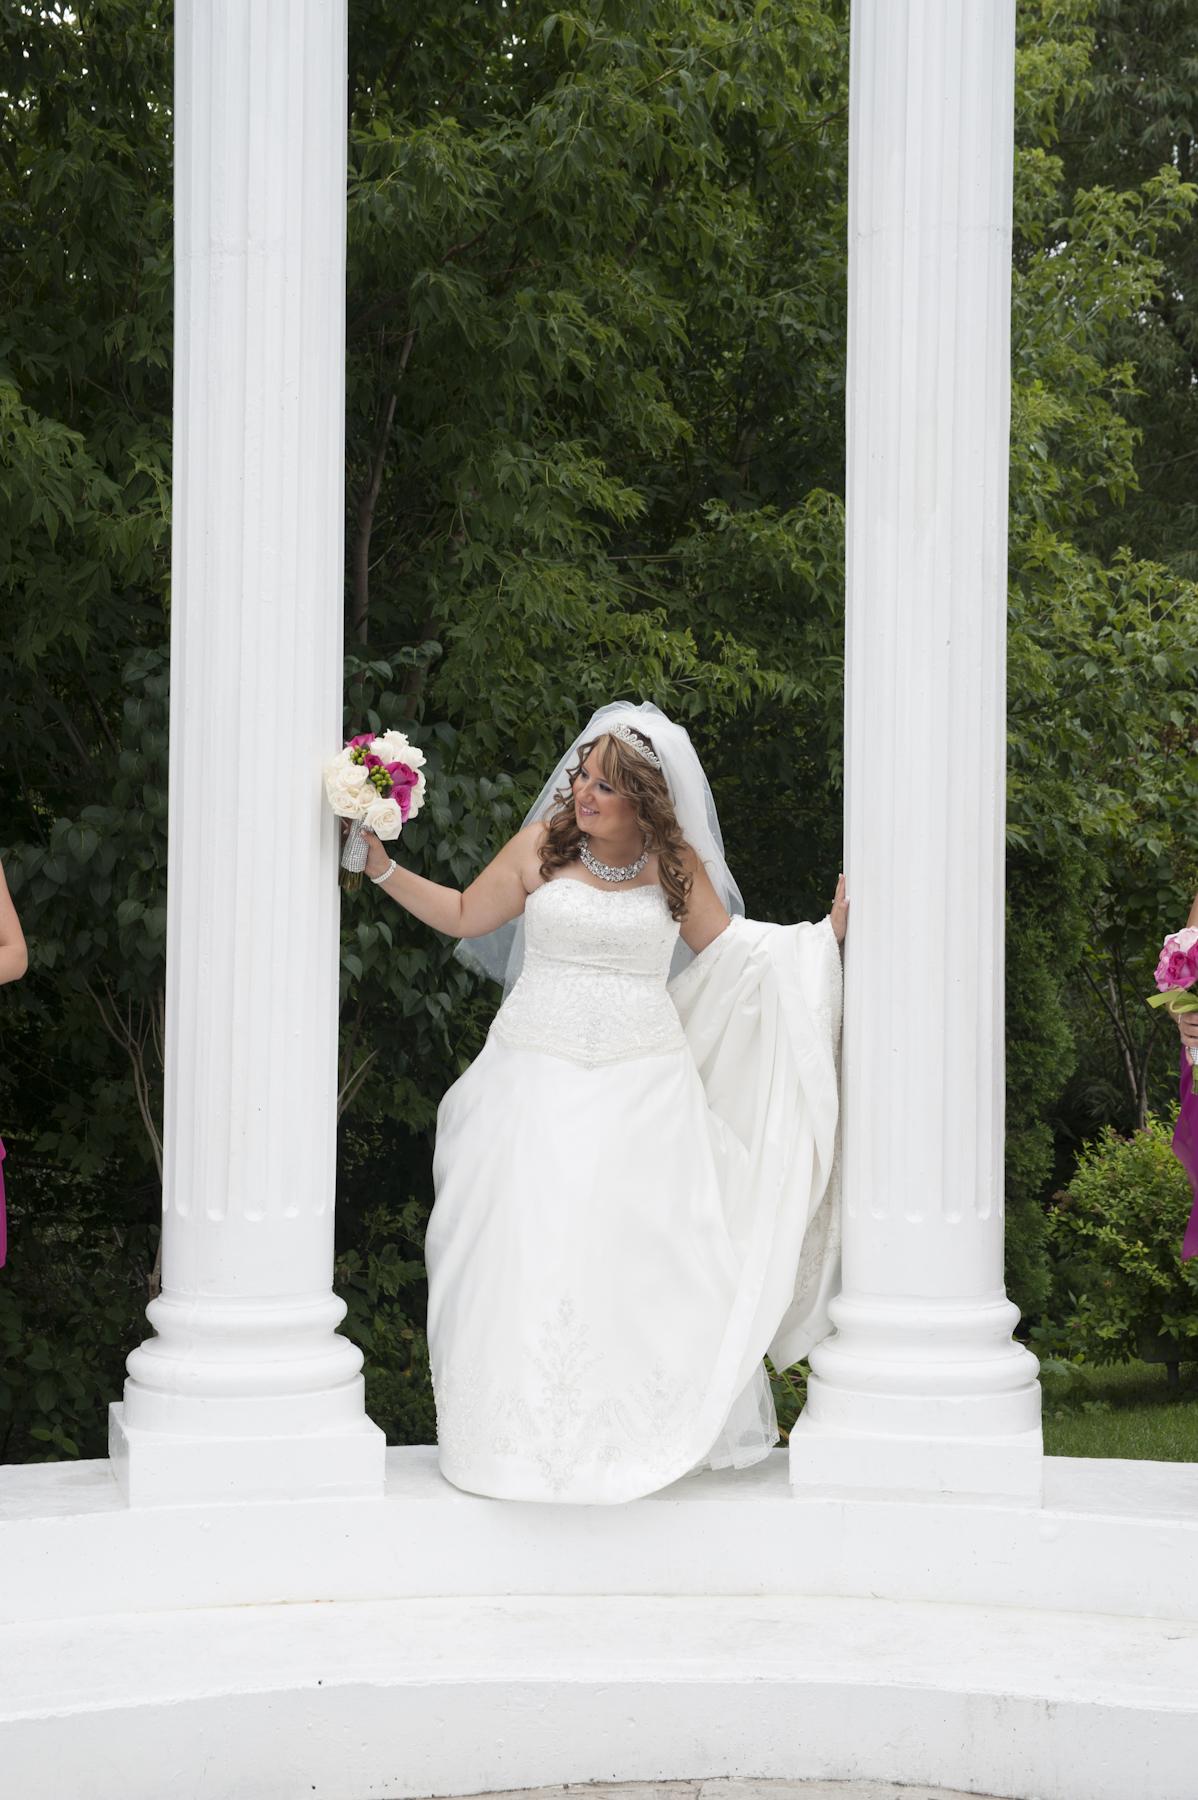 Copy of Copy of Paradise Banquet Hall Bride standing inside atrium